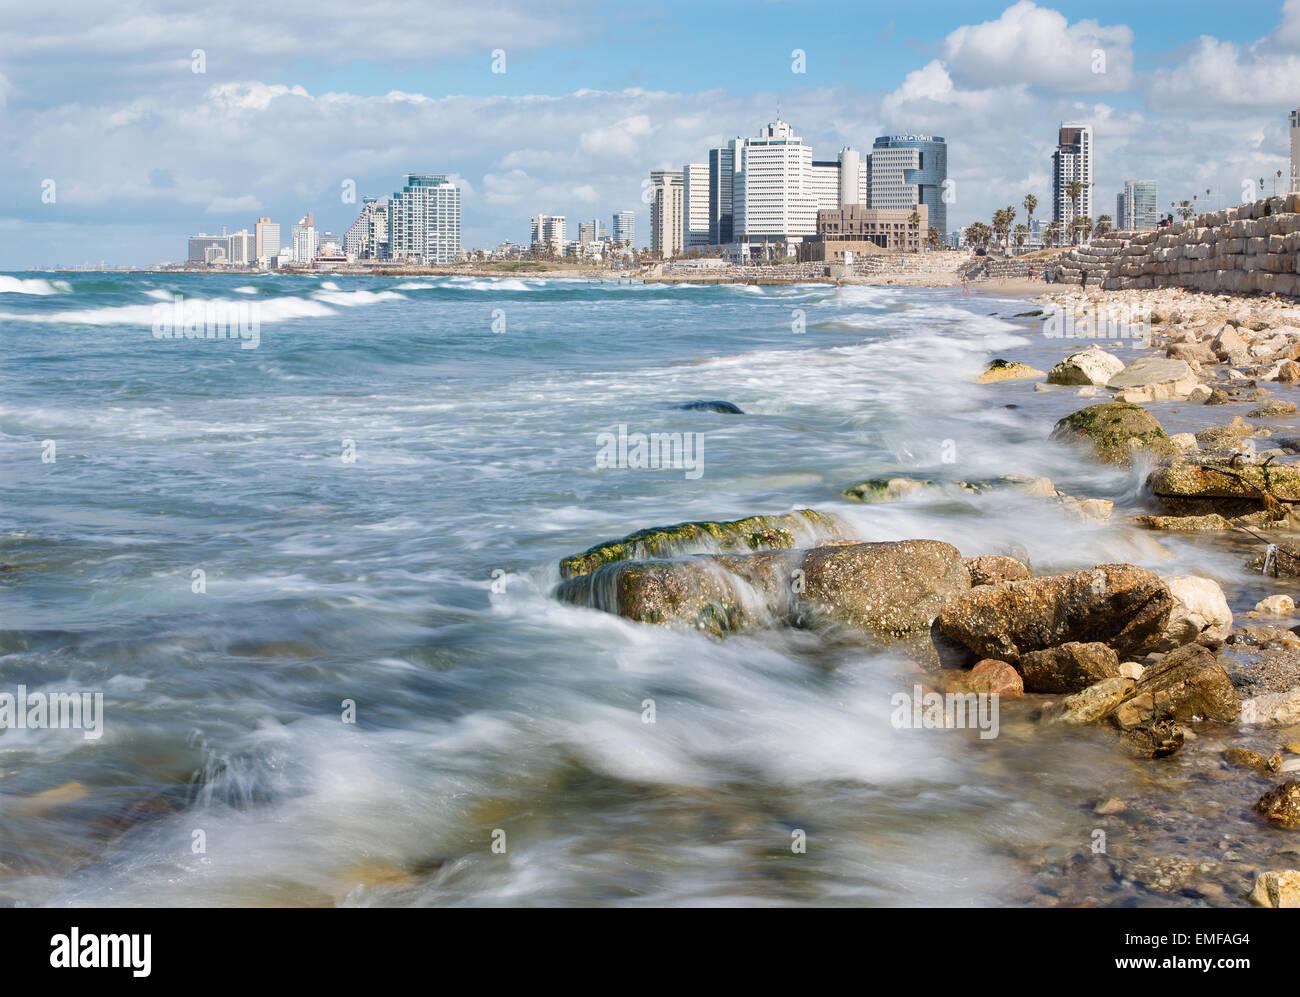 TEL AVIV, ISRAEL - MARCH 2, 2015: The coast of Tel Aviv - Stock Image